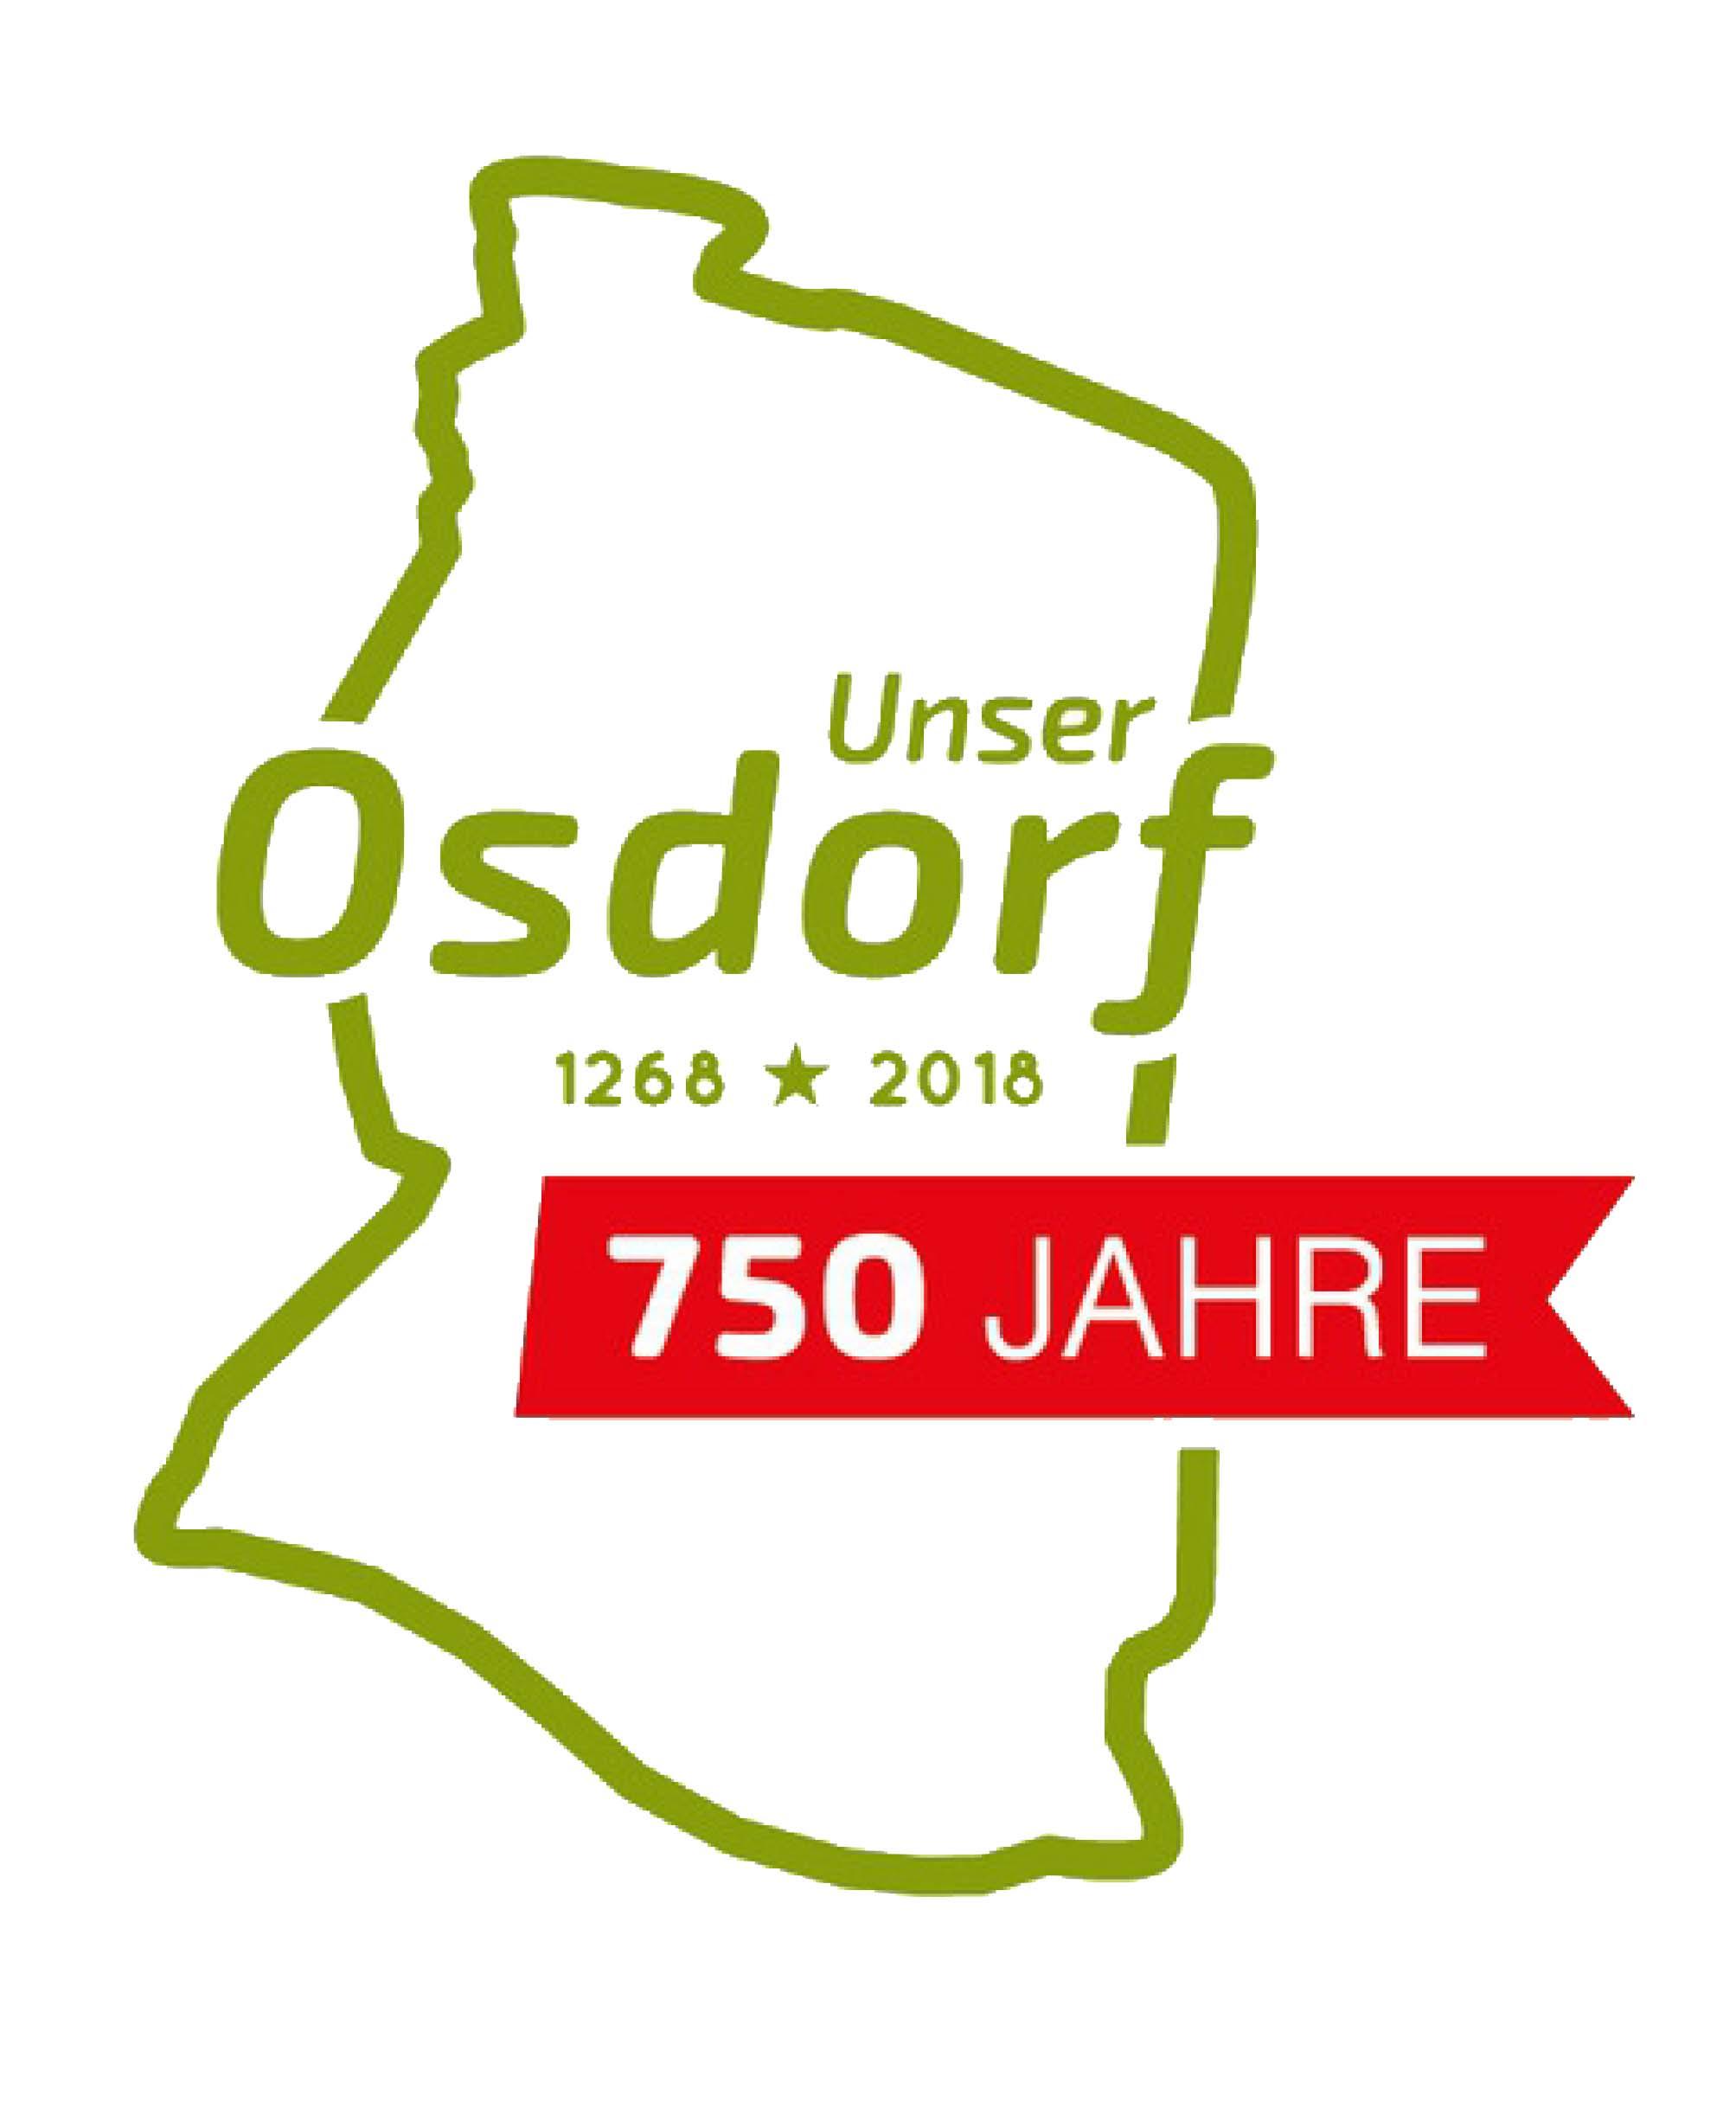 750 Jahre Osdorf